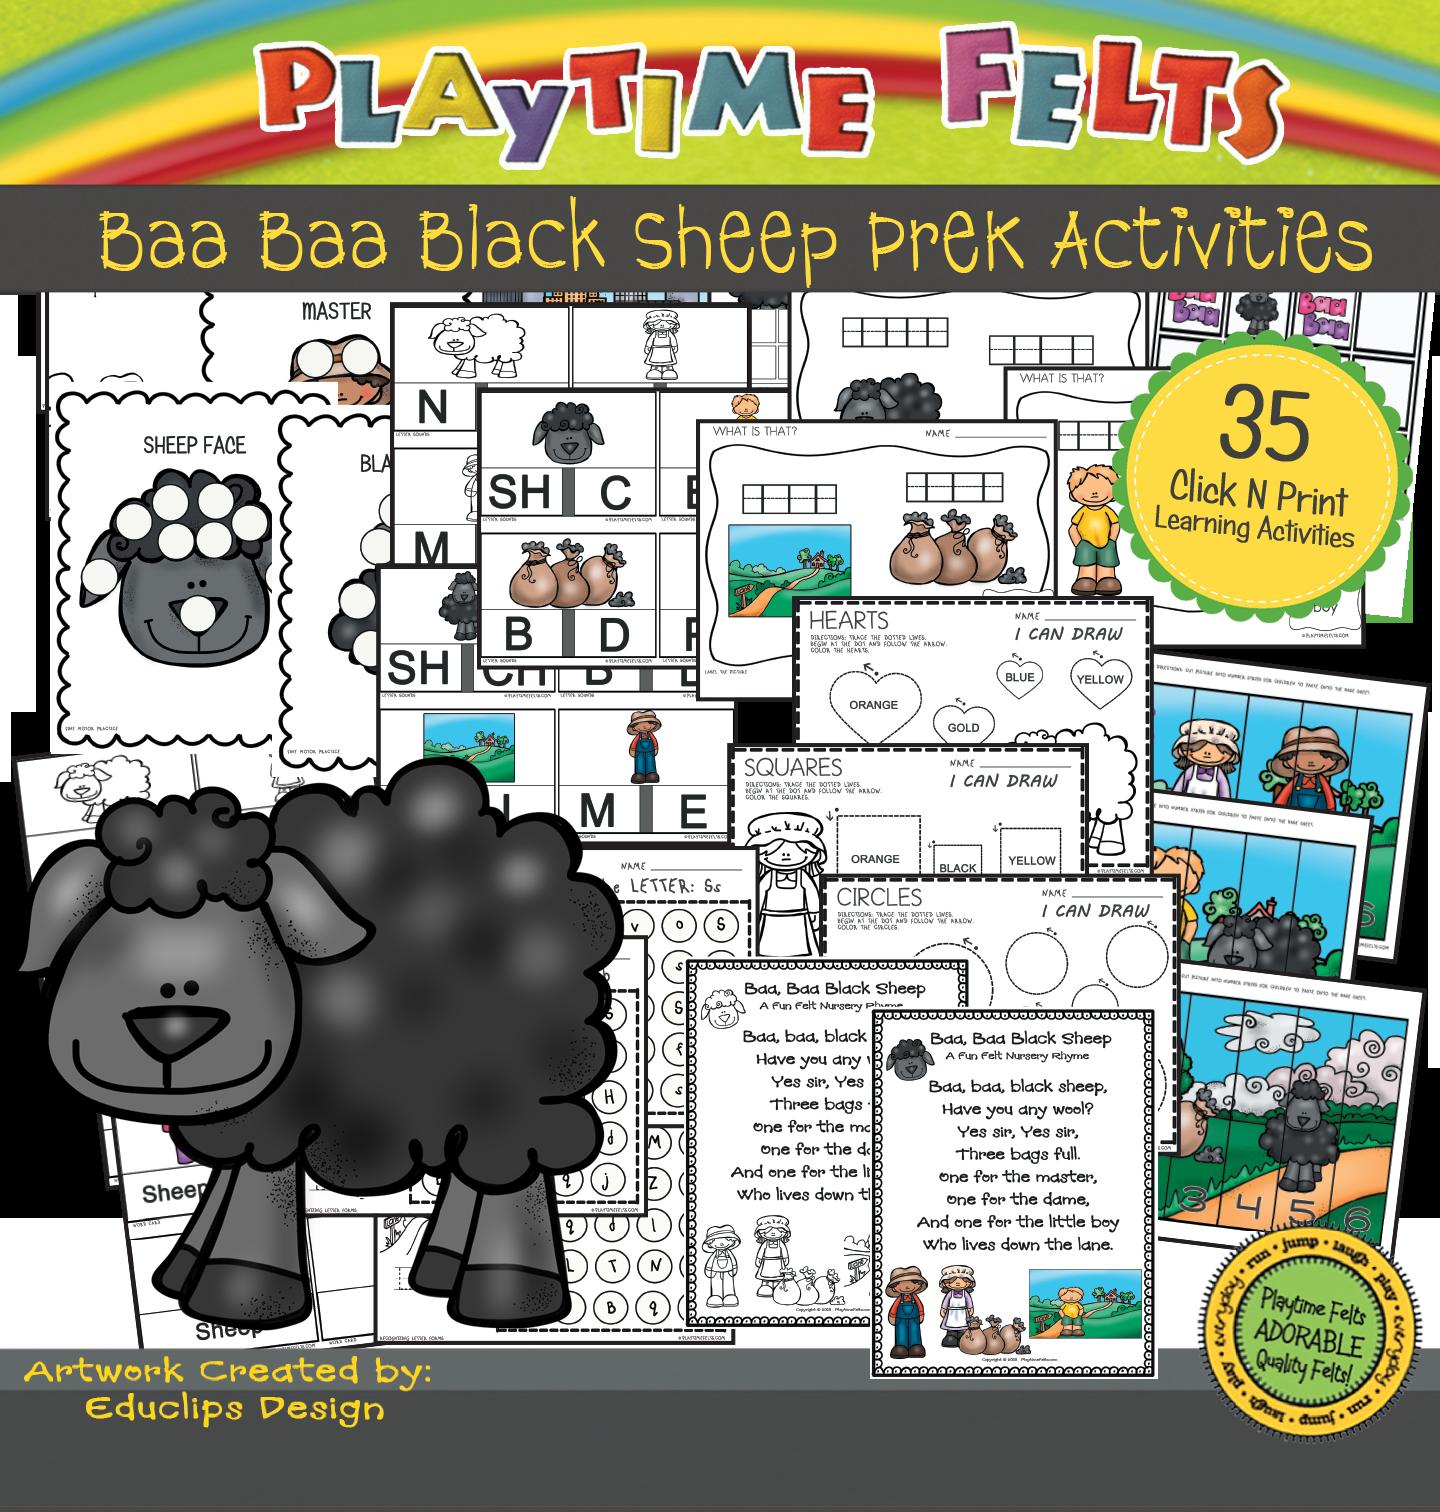 Baa Baa Black Sheep Activity Worksheets For Preschool By Playtime Felts